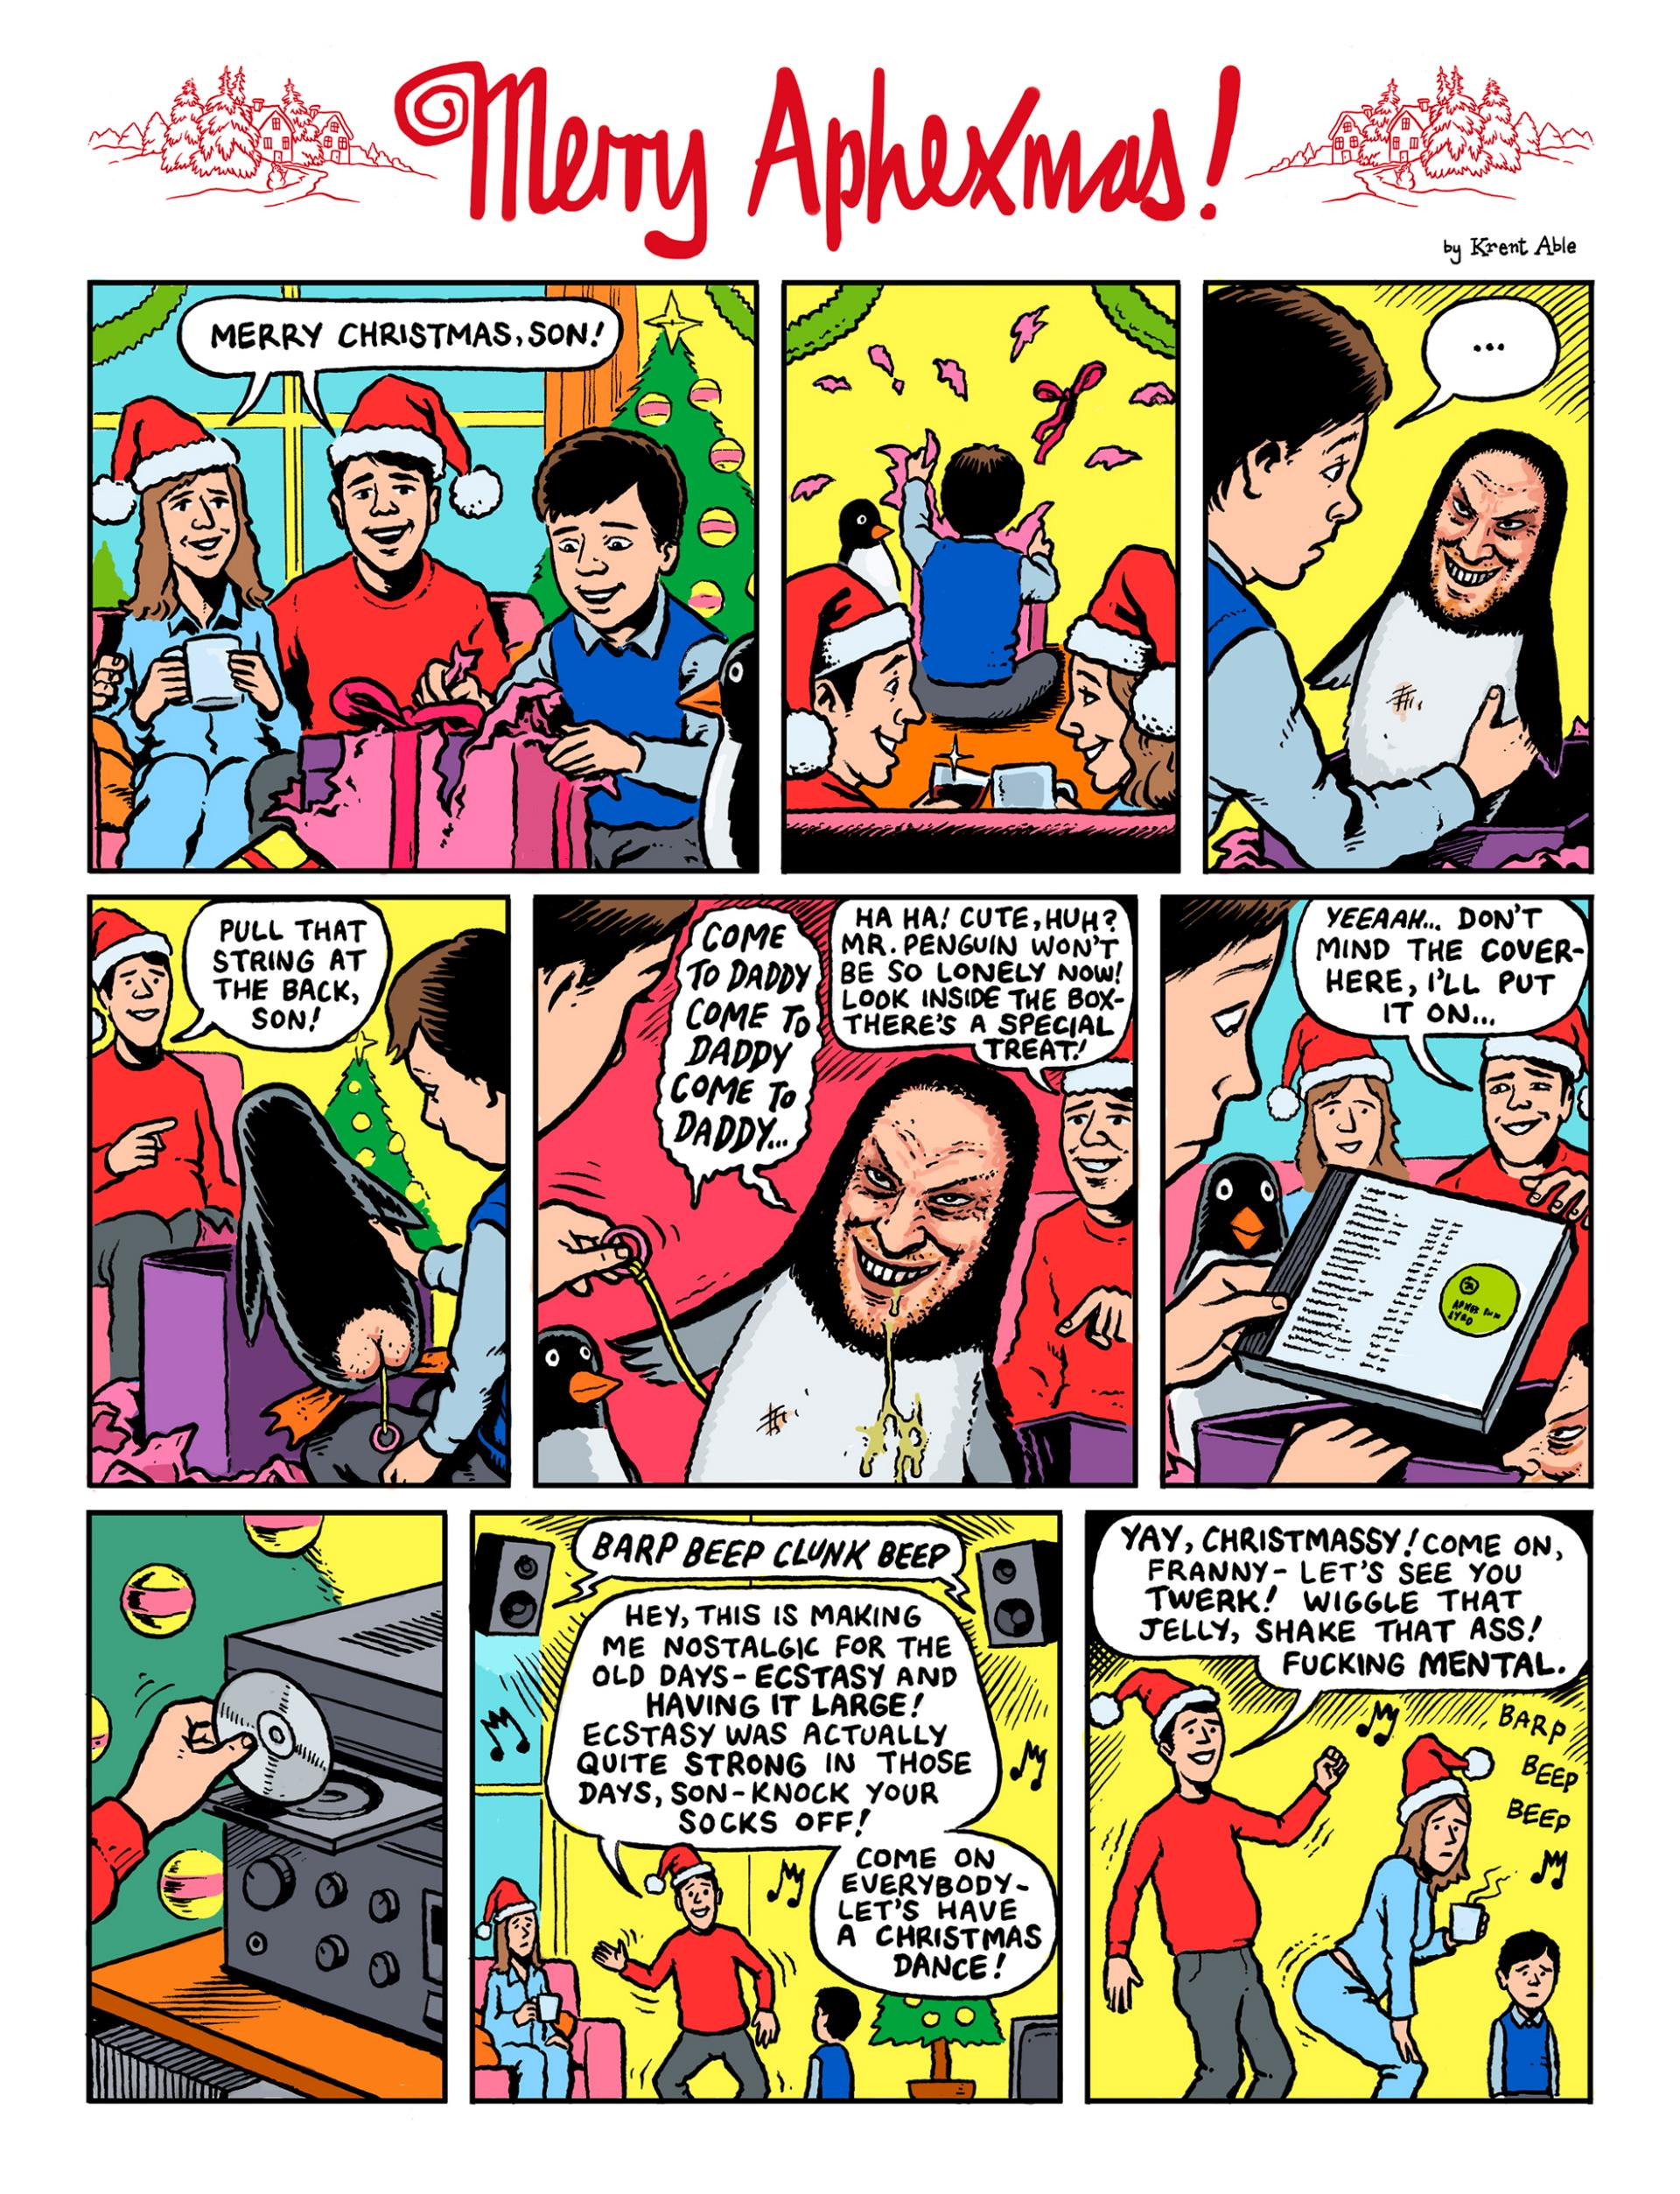 NME Aphex comic p1.jpg